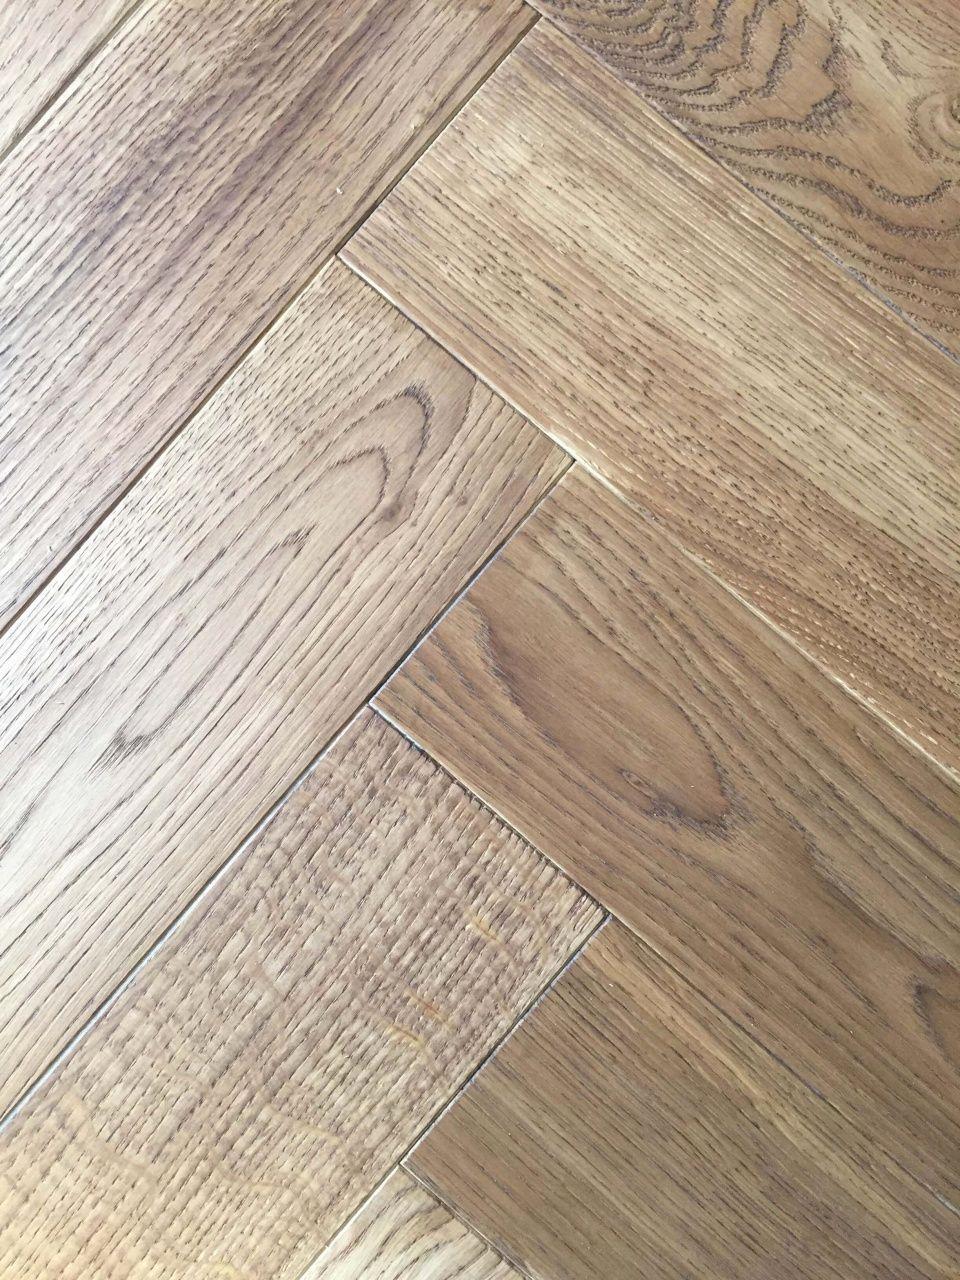 Engineered Wood Floors, Cost To Lay Laminate Flooring Homewyse